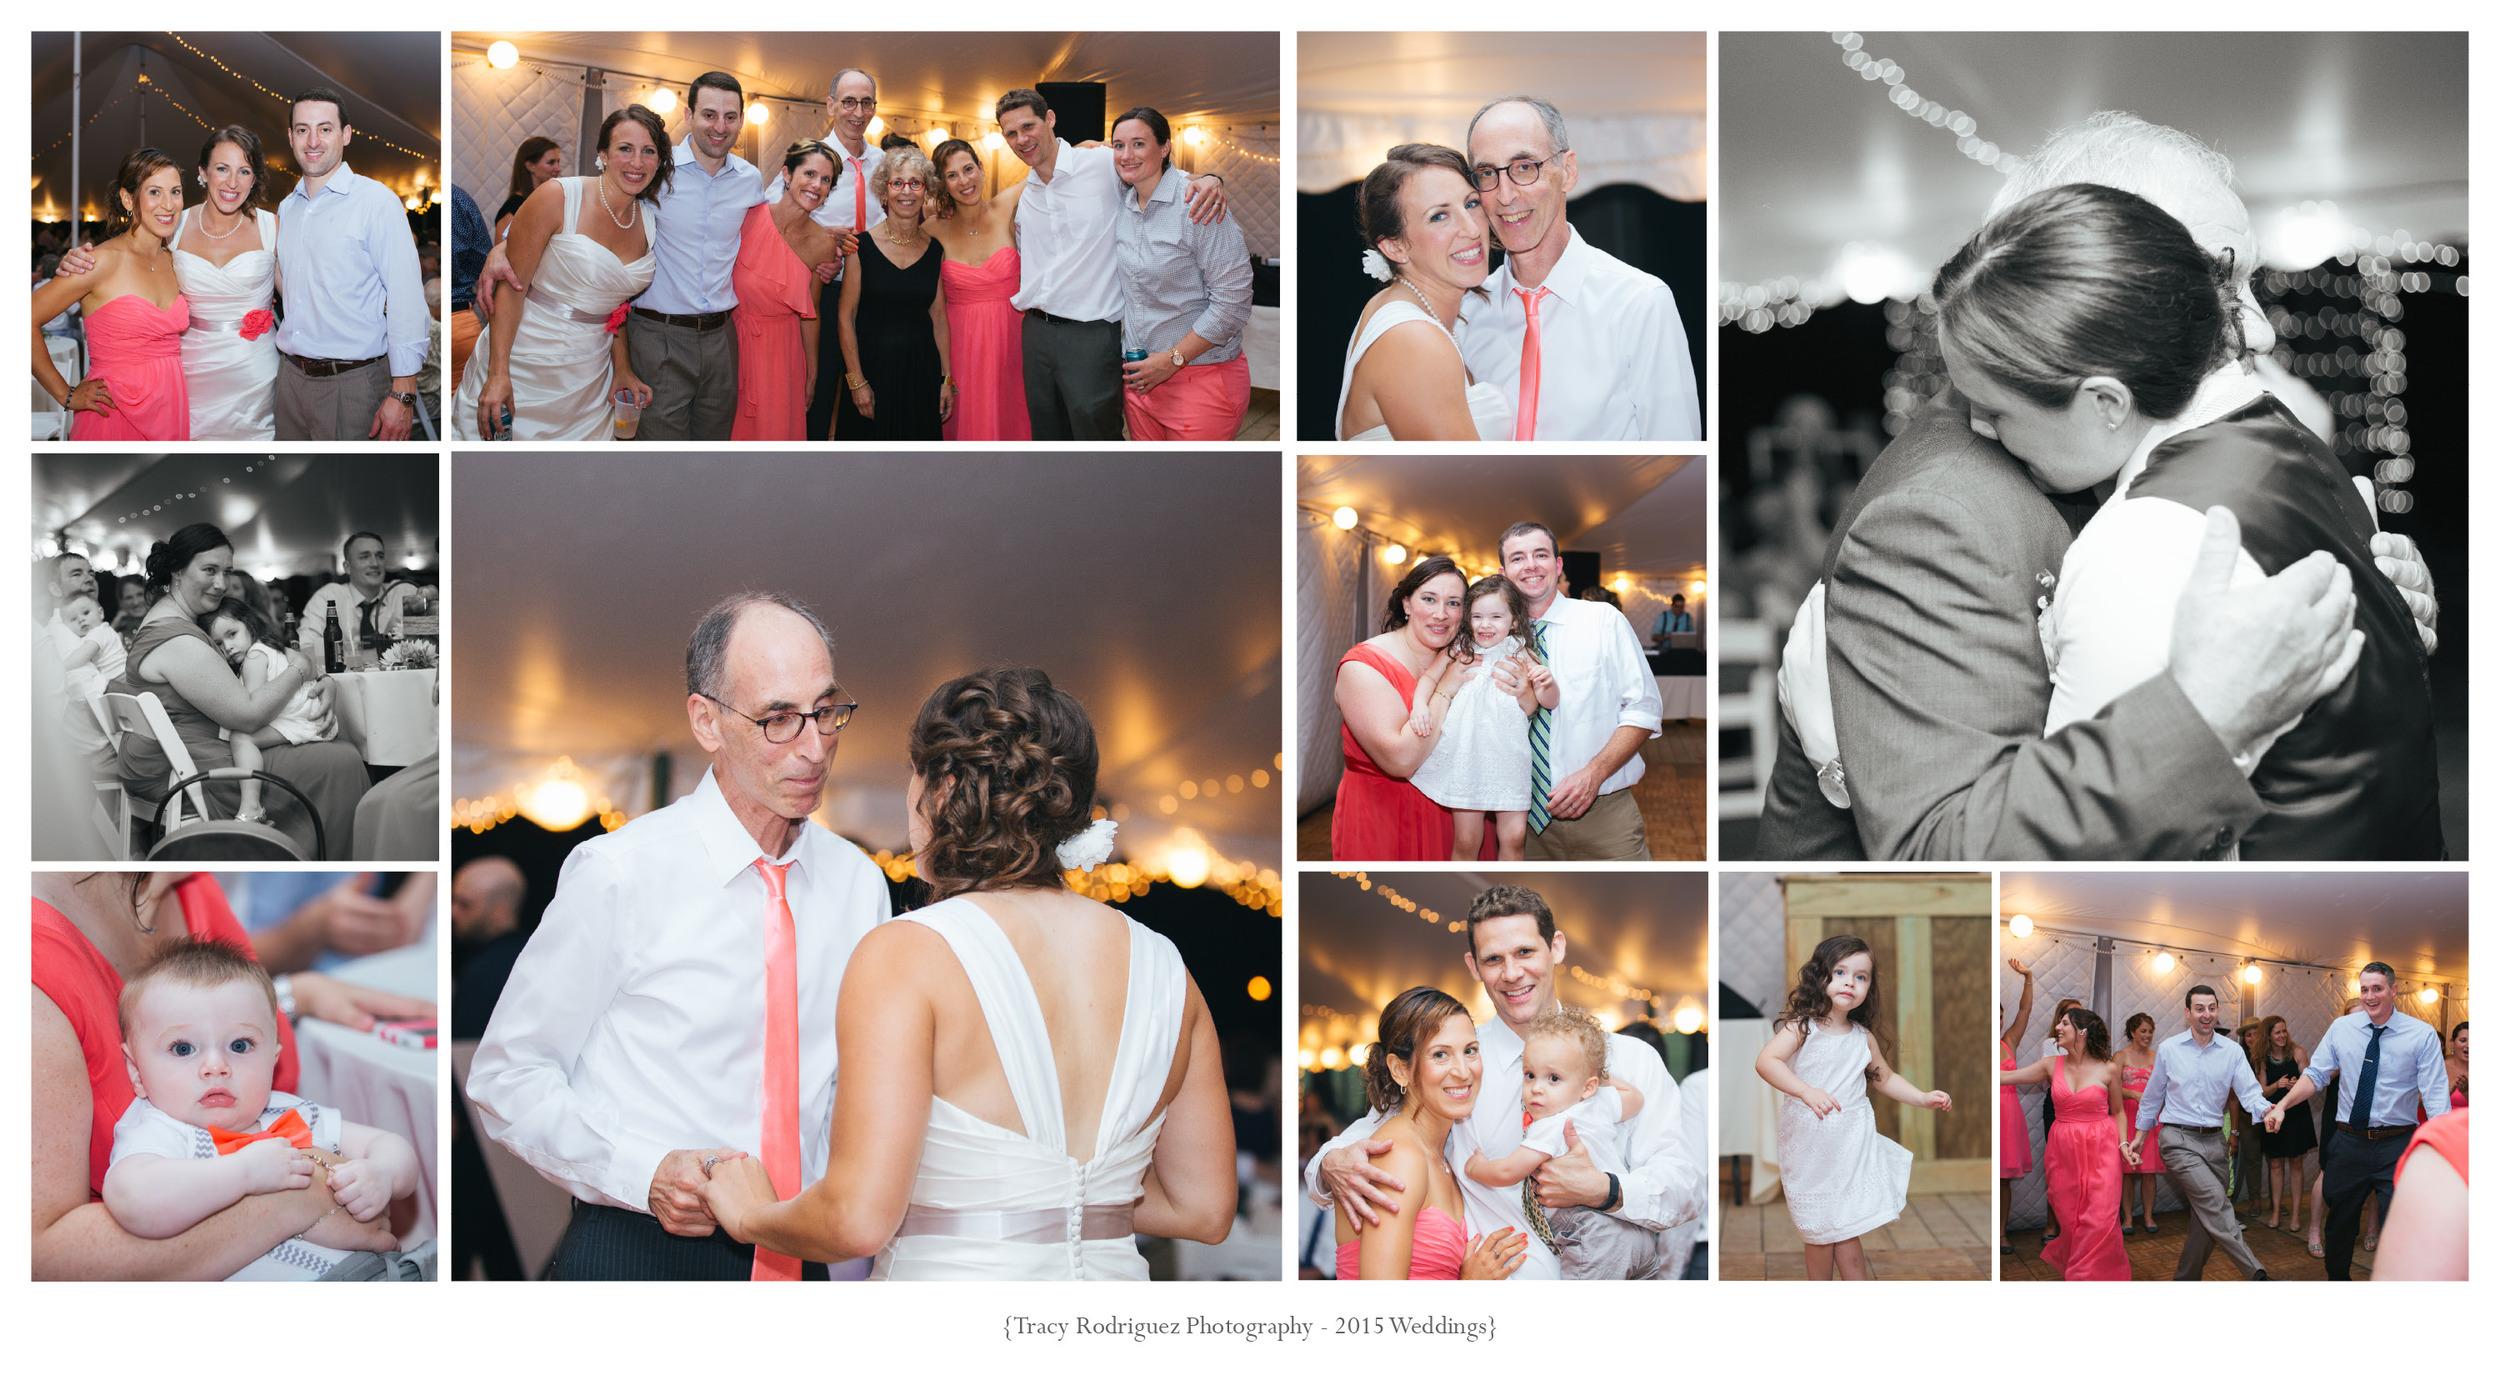 Slackberg Mock Wedding Album22.jpg